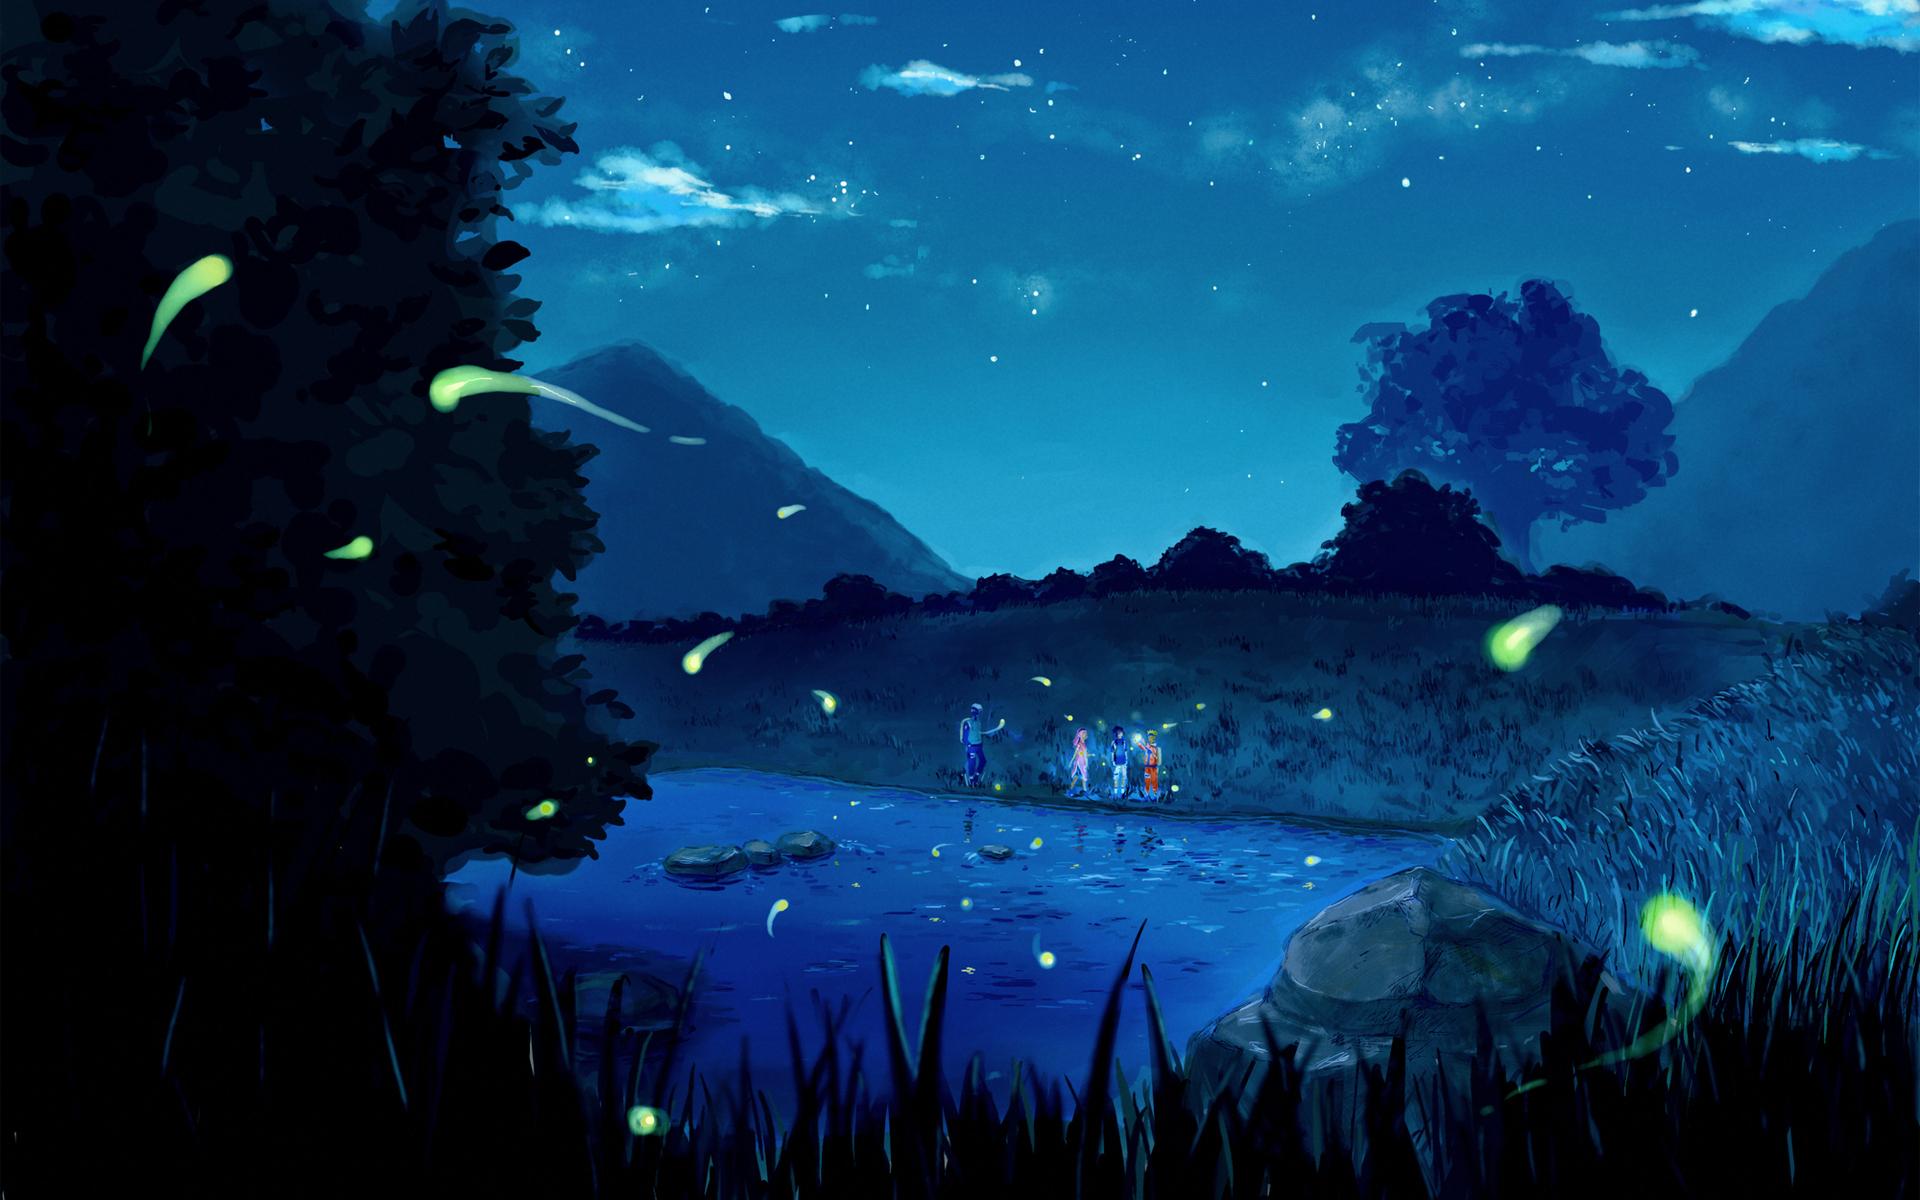 Download mobile wallpaper Anime, Naruto for free.